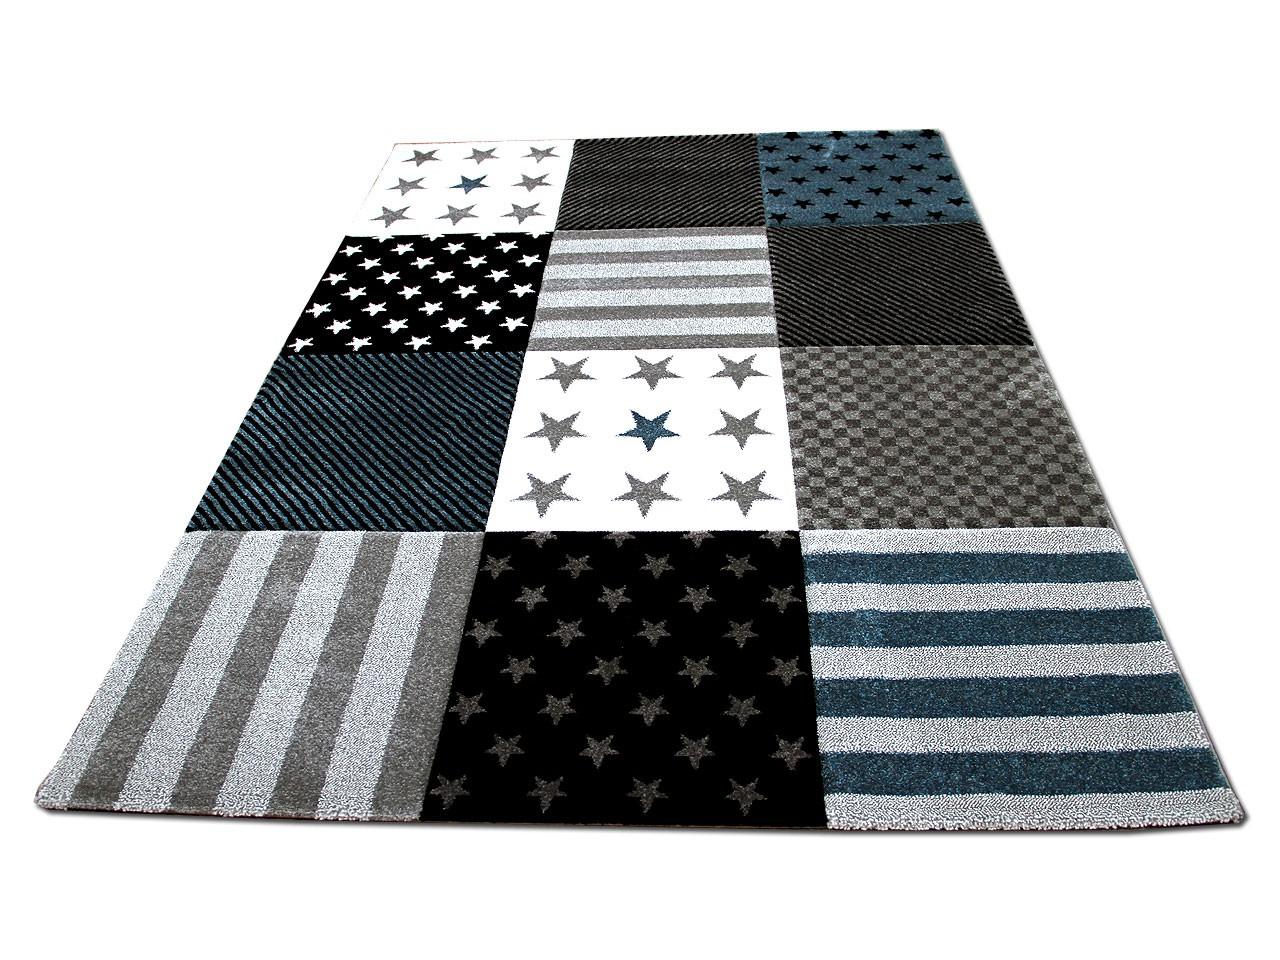 kinder und jugend teppich maui sterne grau t rkis kaufen bei teppichversand24. Black Bedroom Furniture Sets. Home Design Ideas